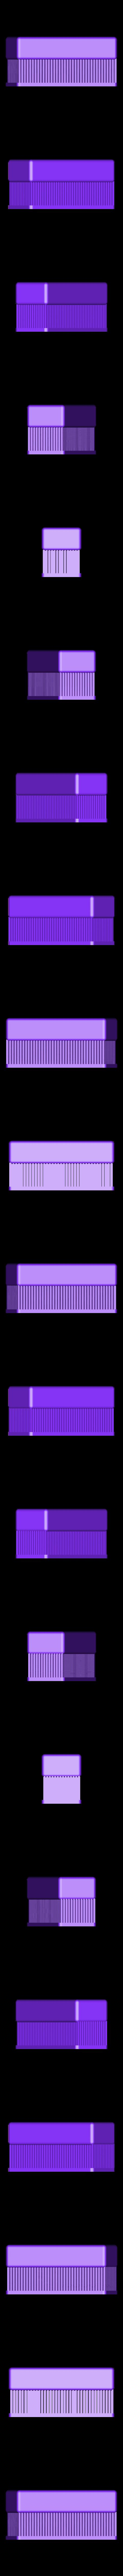 brush_v11.stl Download free STL file Hand Brush fully printed • 3D print design, squiqui